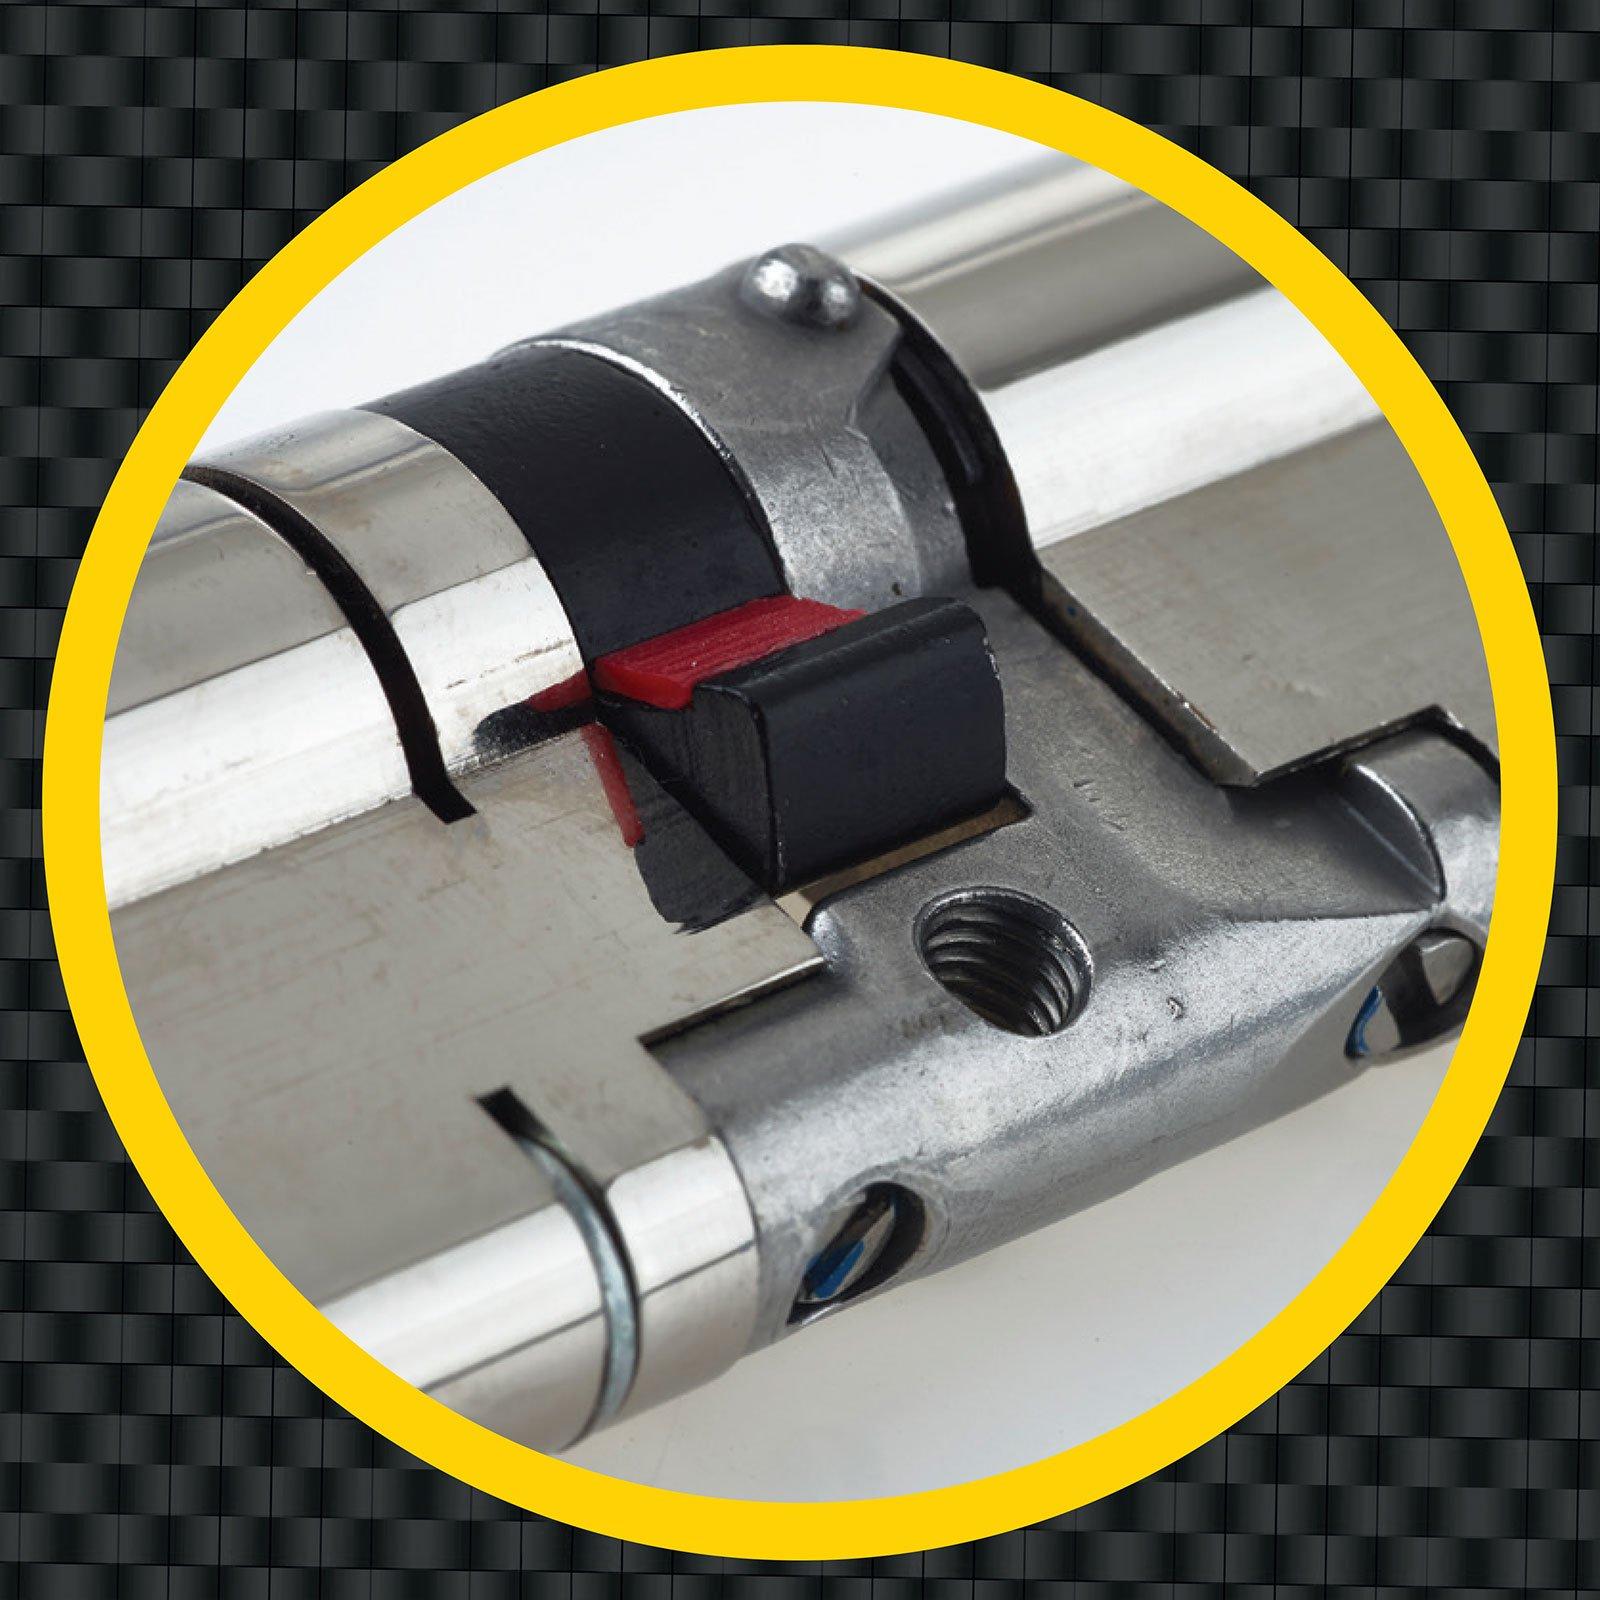 3 Extra Keys 45//55 Brass YALE Platinum 3 Star Euro Cylinder Anti Snap Bump High Security uPVC Door Barrel TS2007:2013 Lock 100mm 6 total